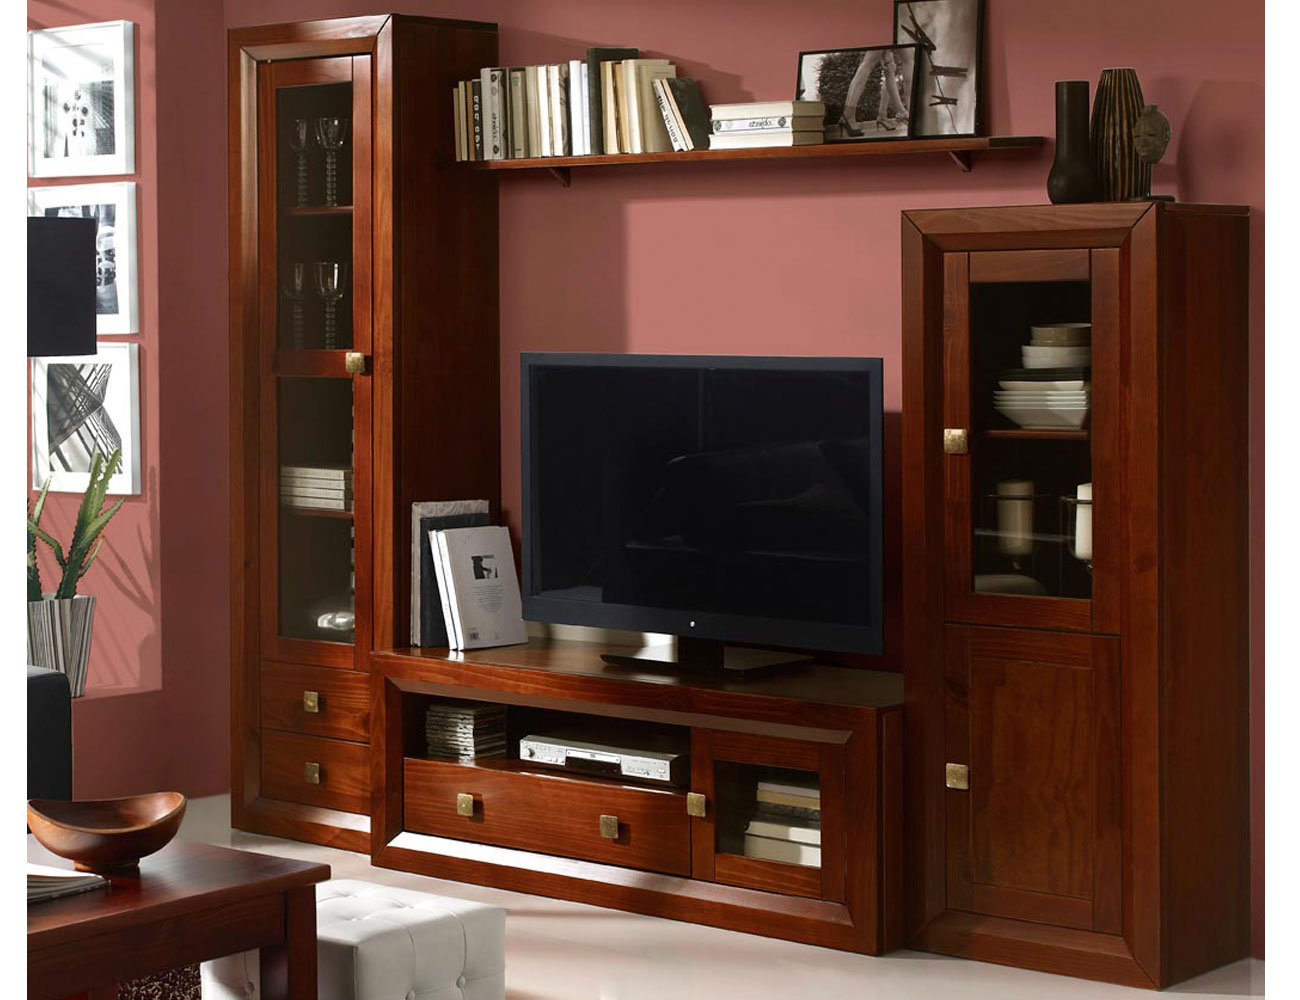 Muebles salon comedor nogal madera dm vitrina bodeguero tv